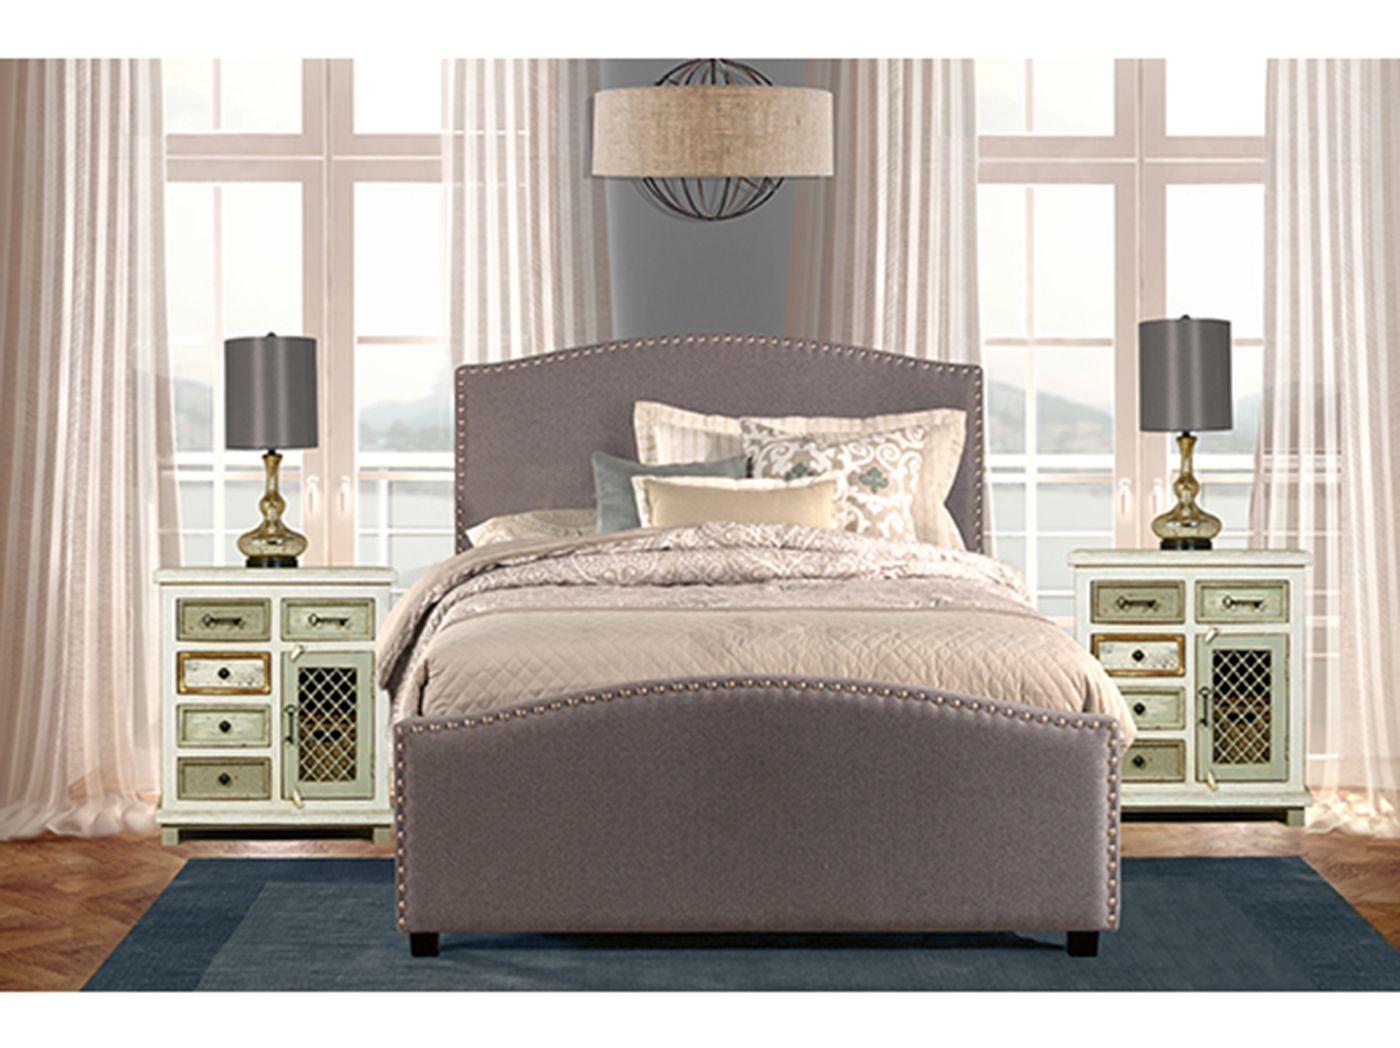 Kerstein King Bed Bed, California king headboard